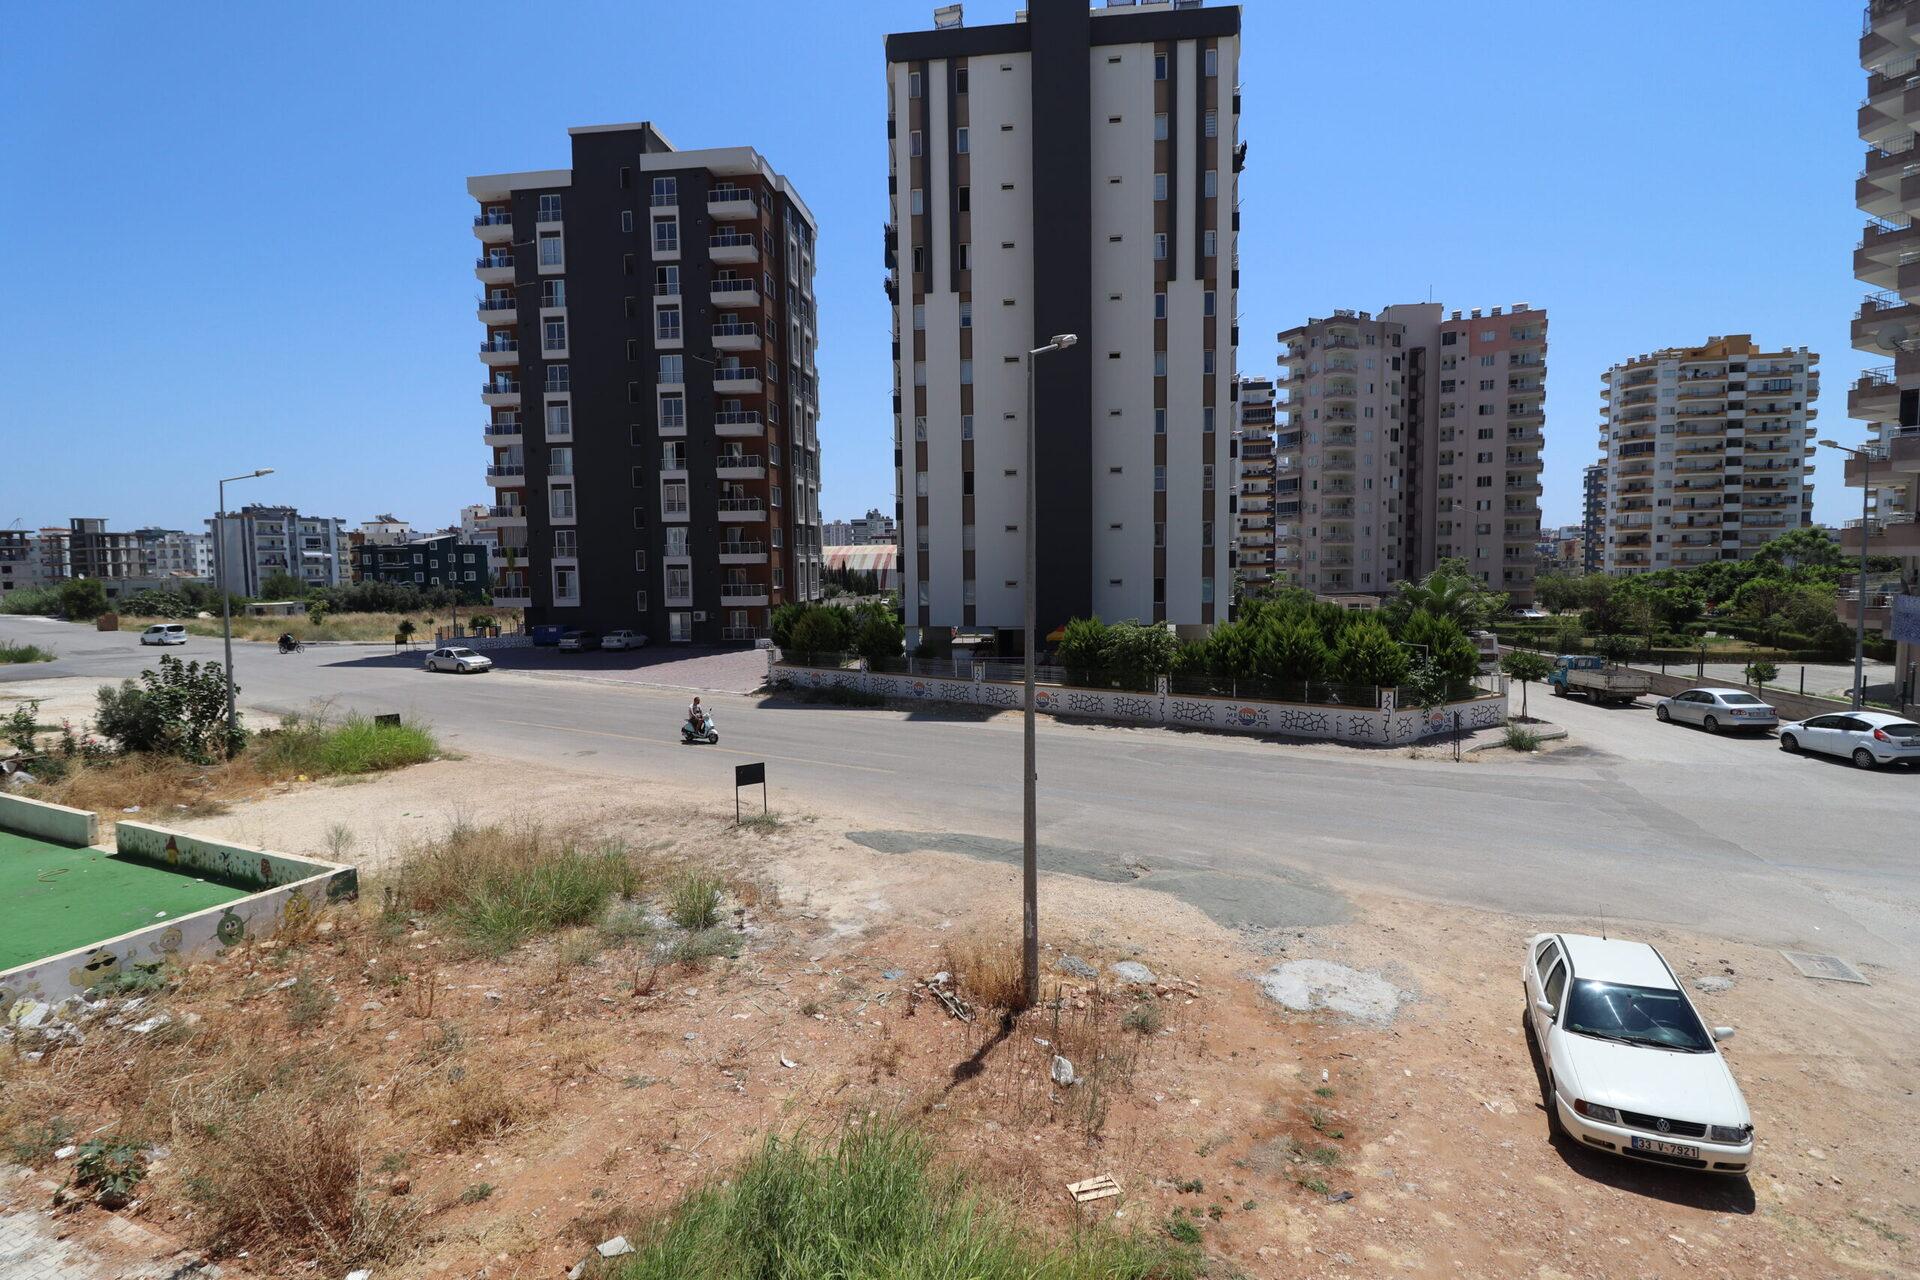 Mersin Erdemli Alata Mah. 3+1 gemeubileerde flat te koop